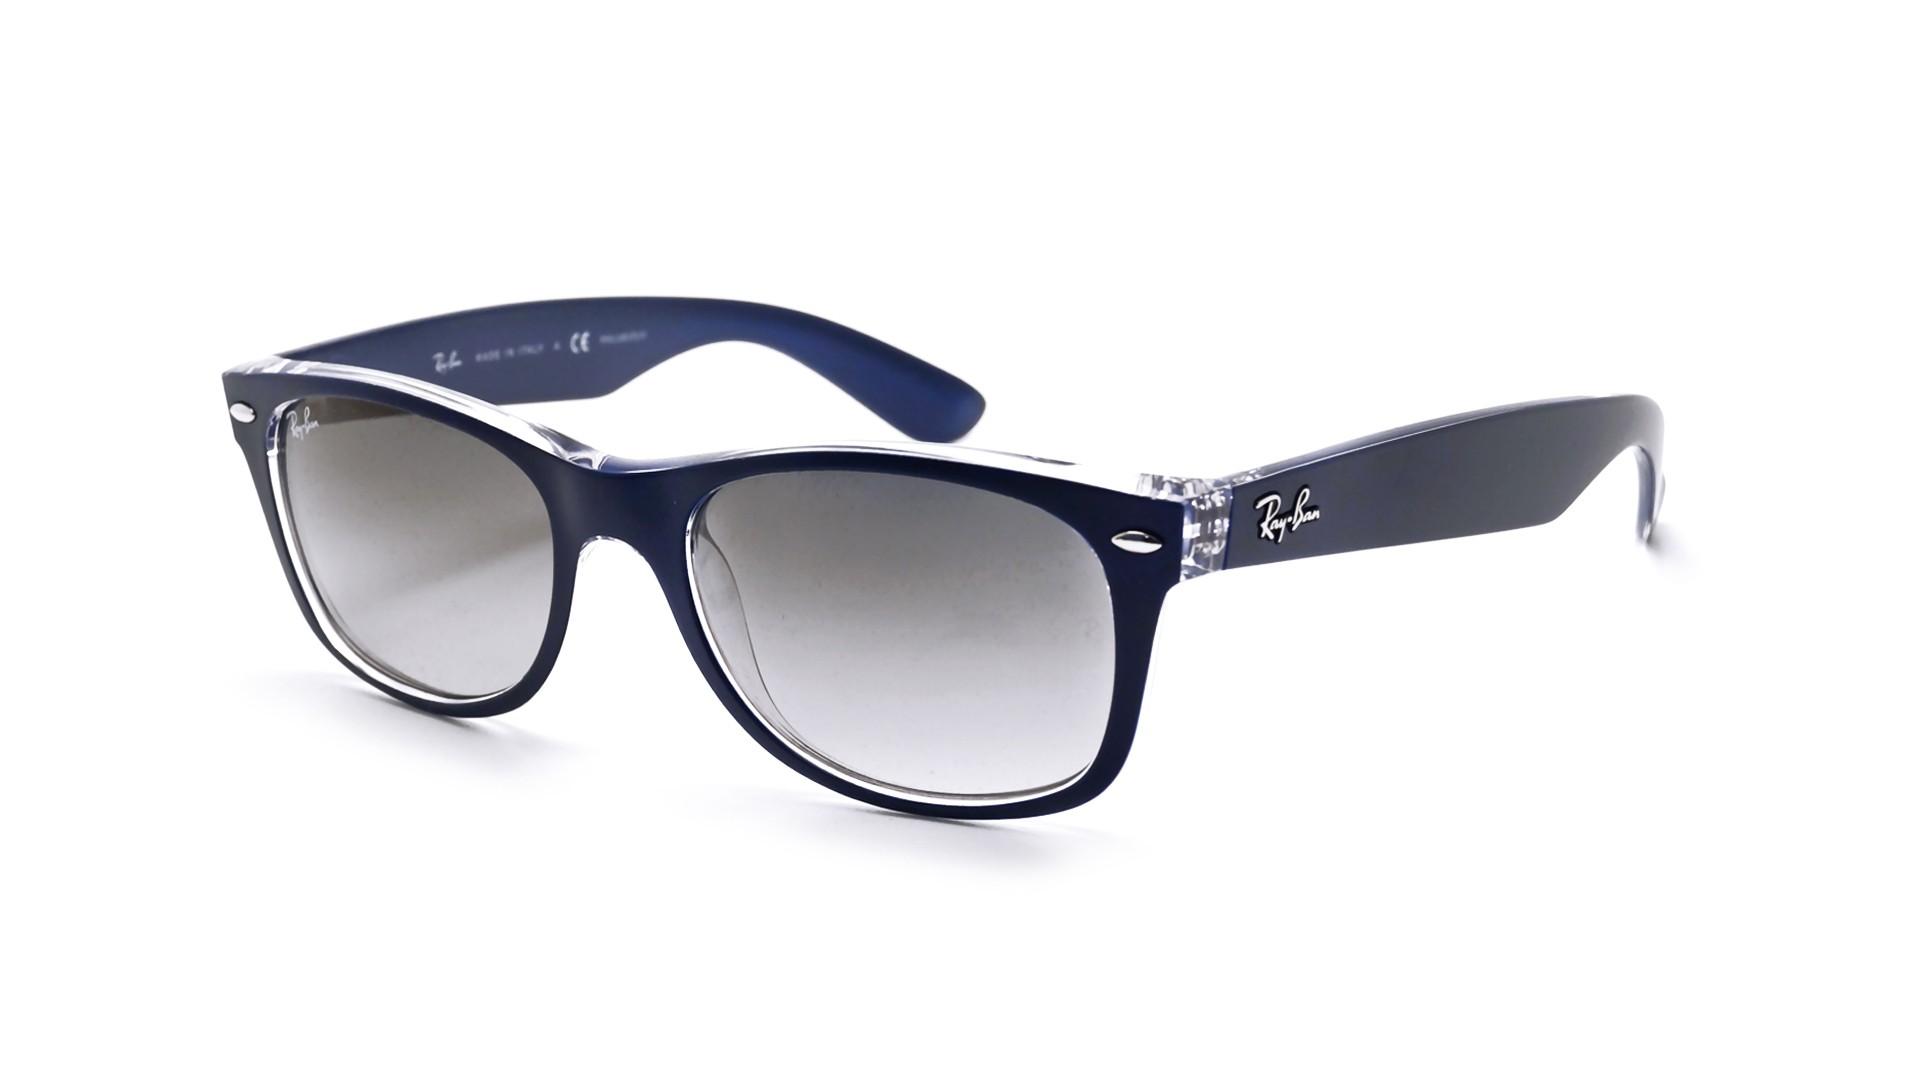 b843fae601f Sunglasses Ray-Ban New Wayfarer Blue RB2132 6053 71 52-18 Medium Gradient